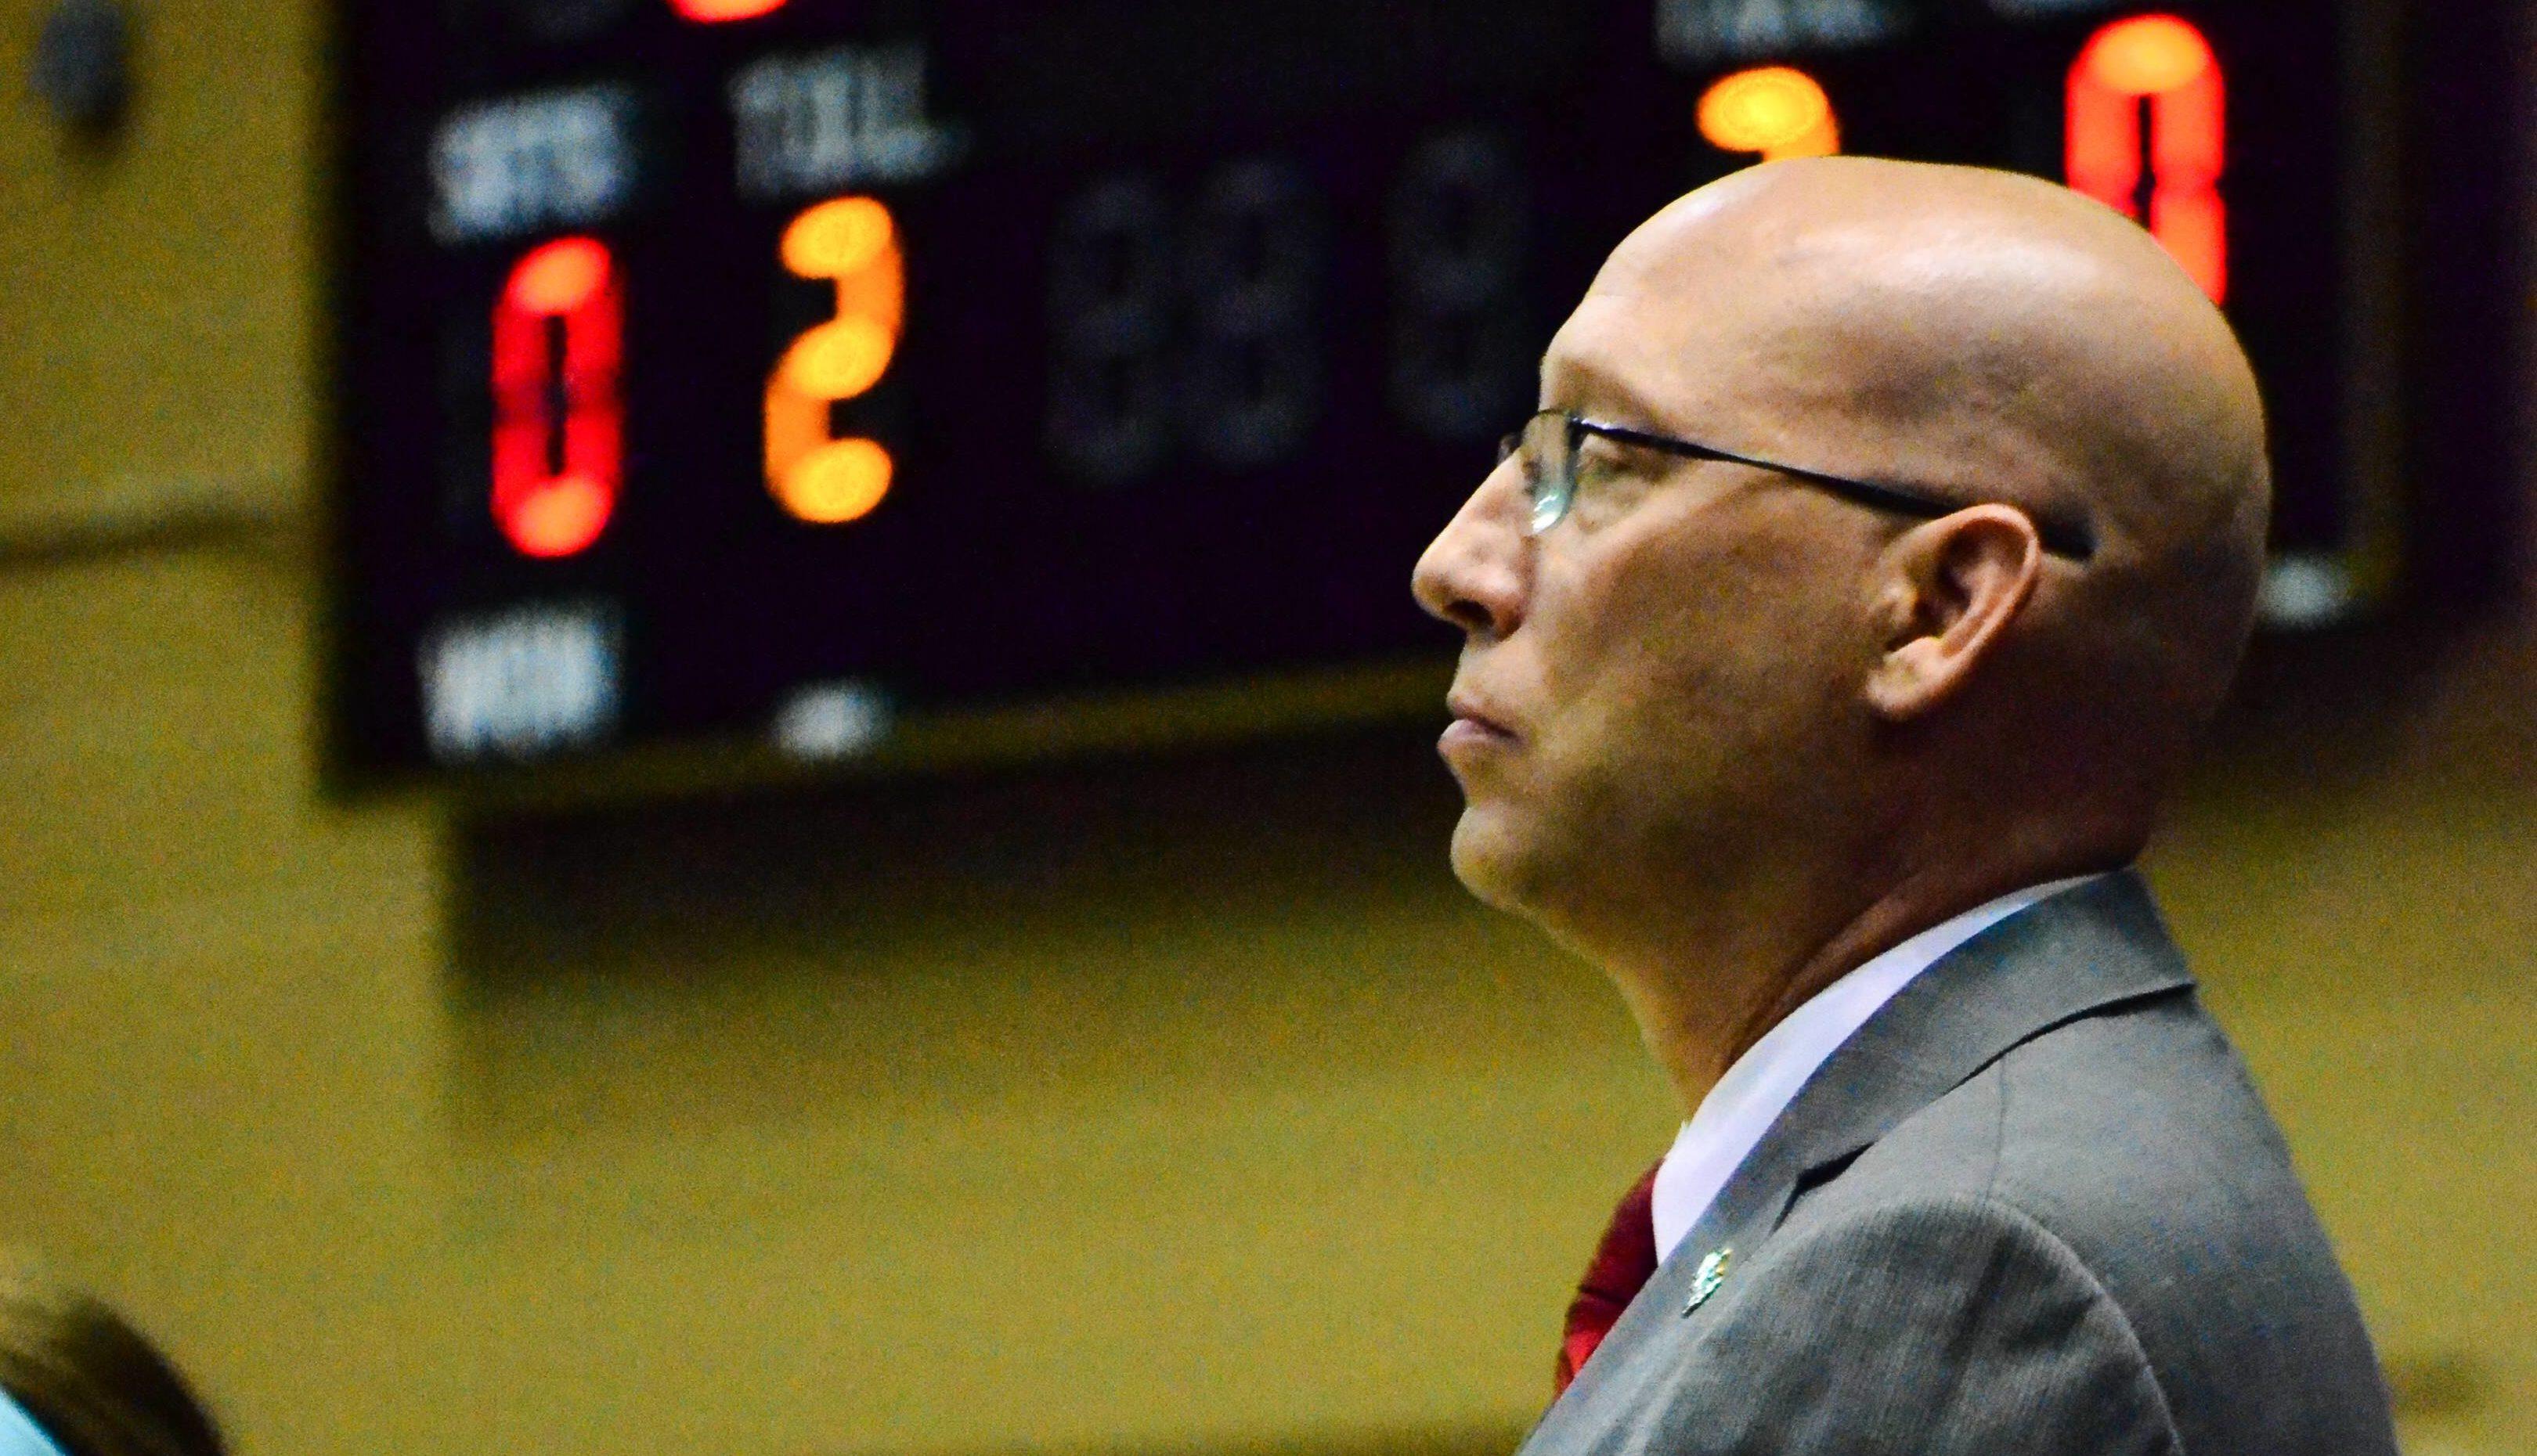 UCF Volleyball head coach Todd Dagenais (Photo: Derek Warden)